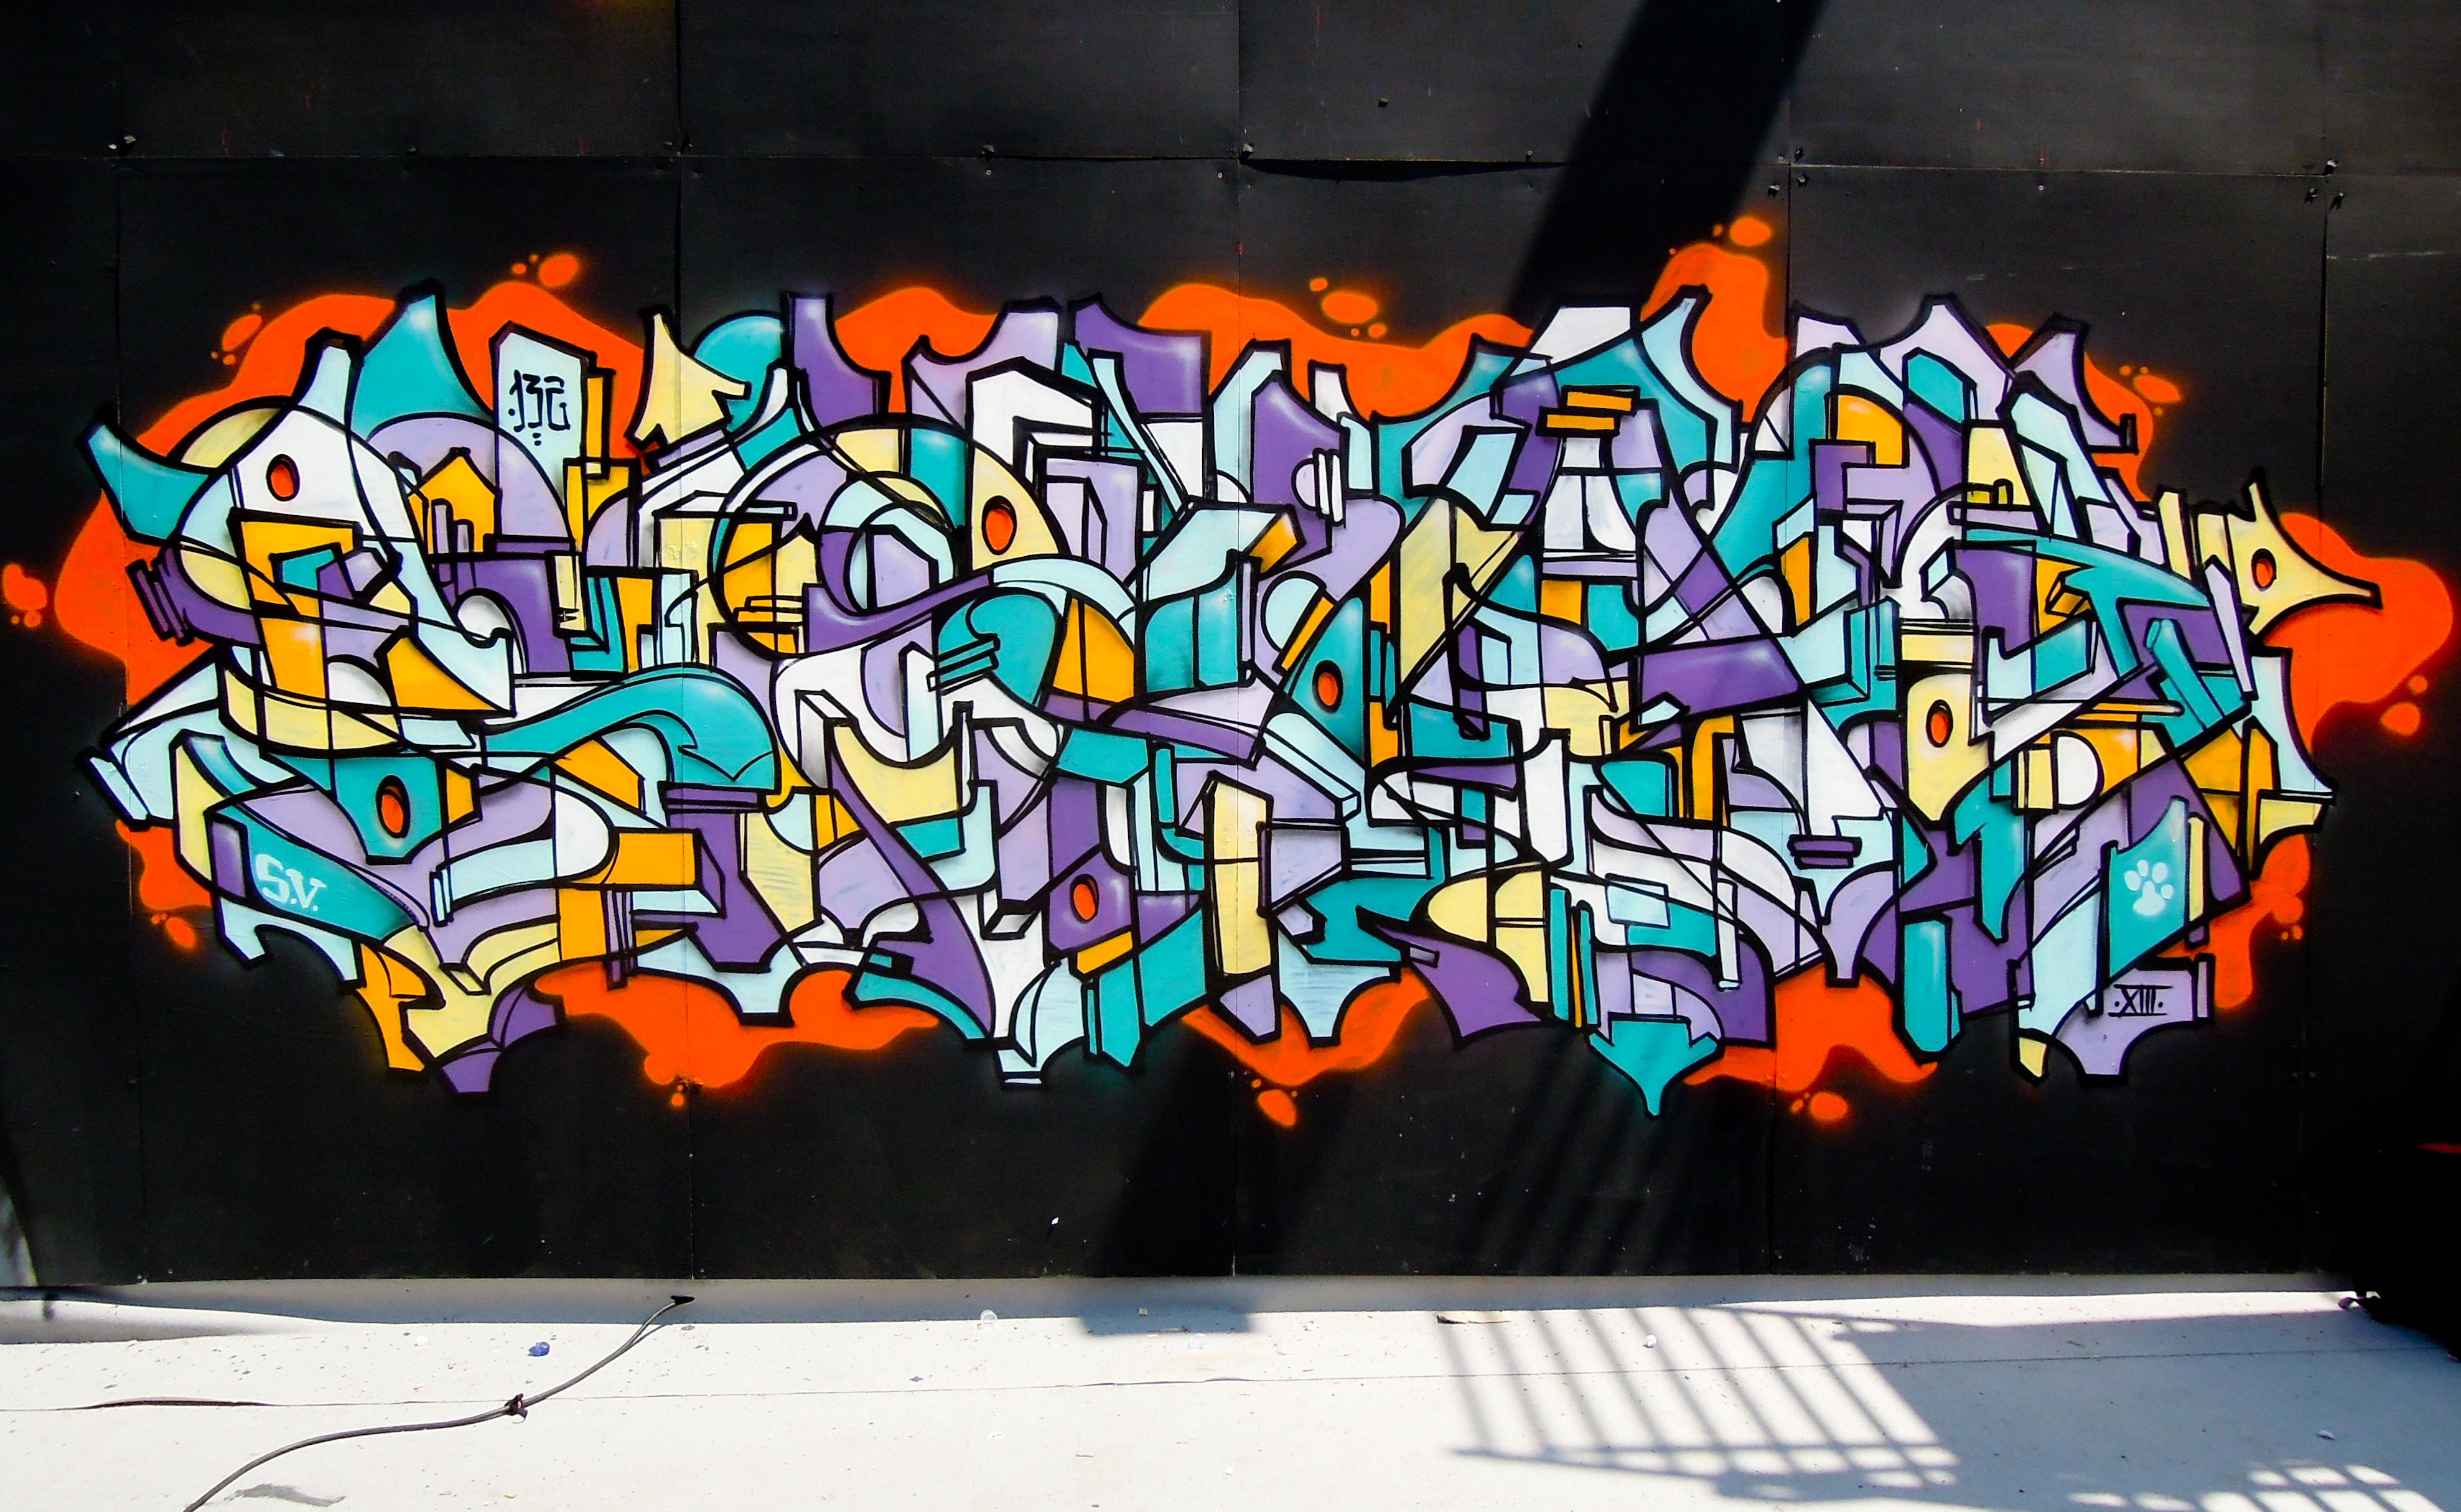 Soklak fresque déco